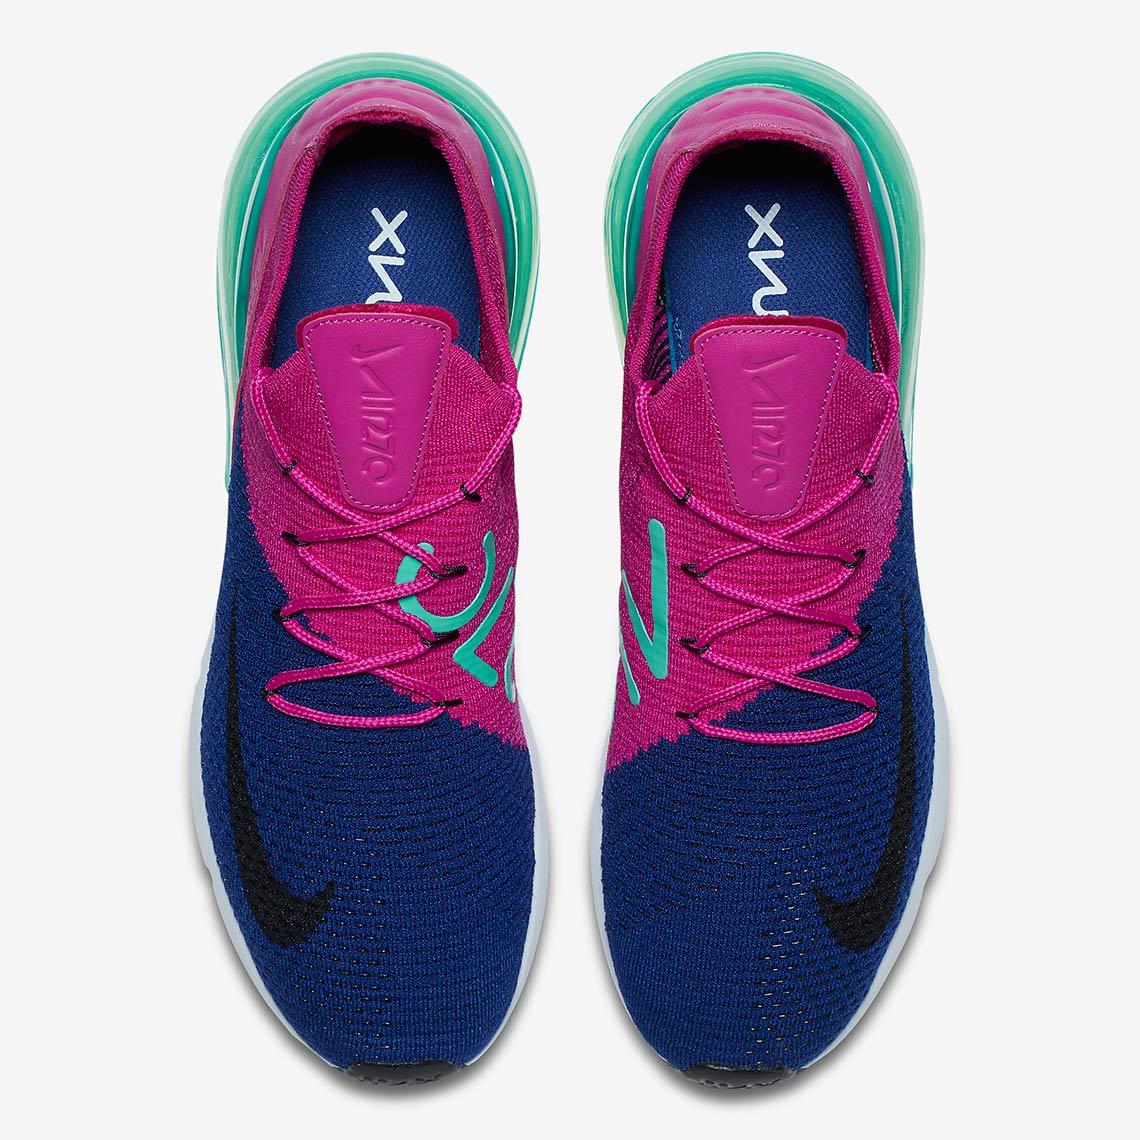 39fd0c3d3b71 Nike Air Max 270 Flyknit Fuschia Teal Release Info AO1023-401 ...